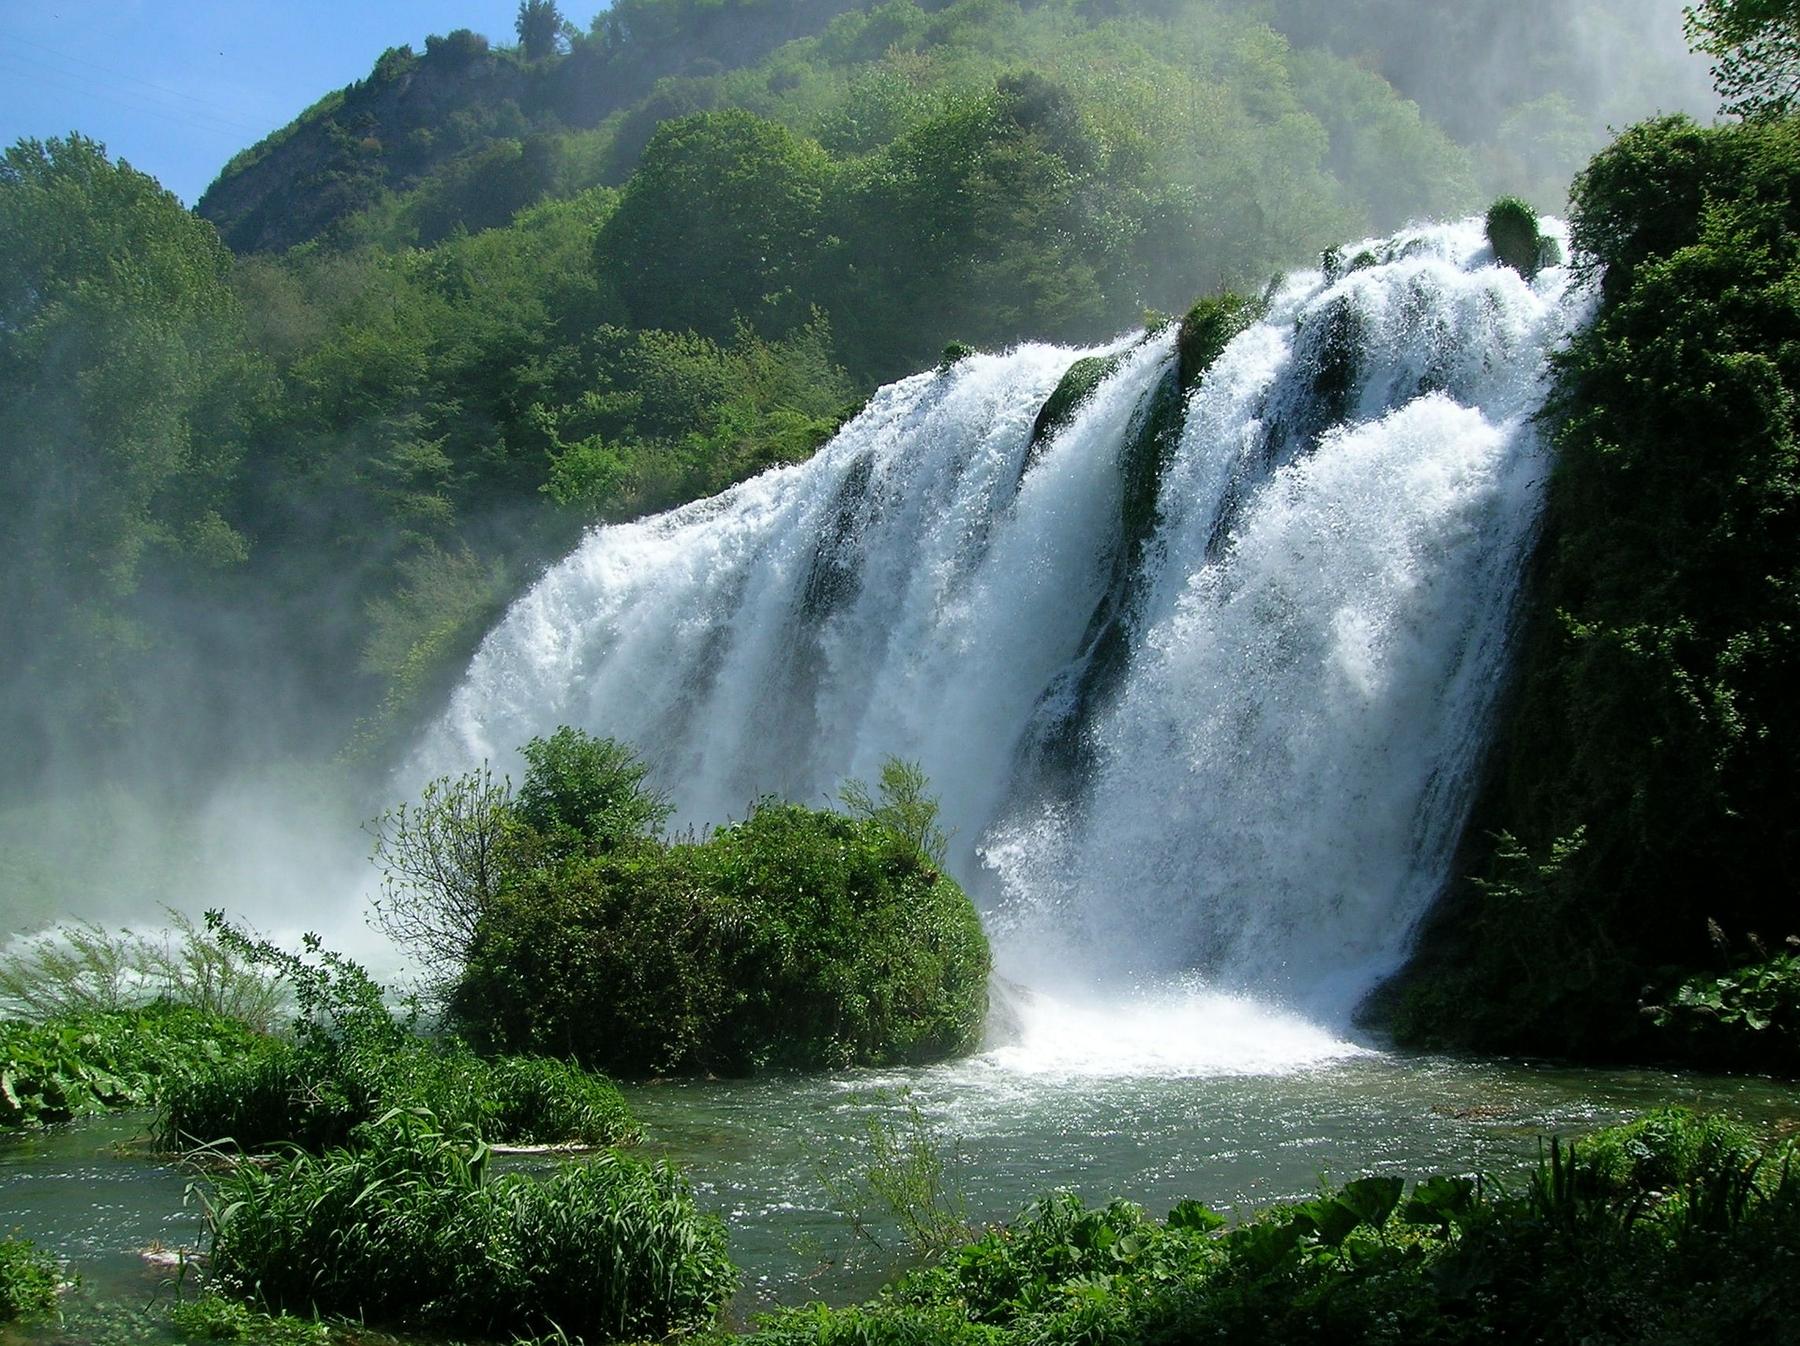 cascate belle in Italia